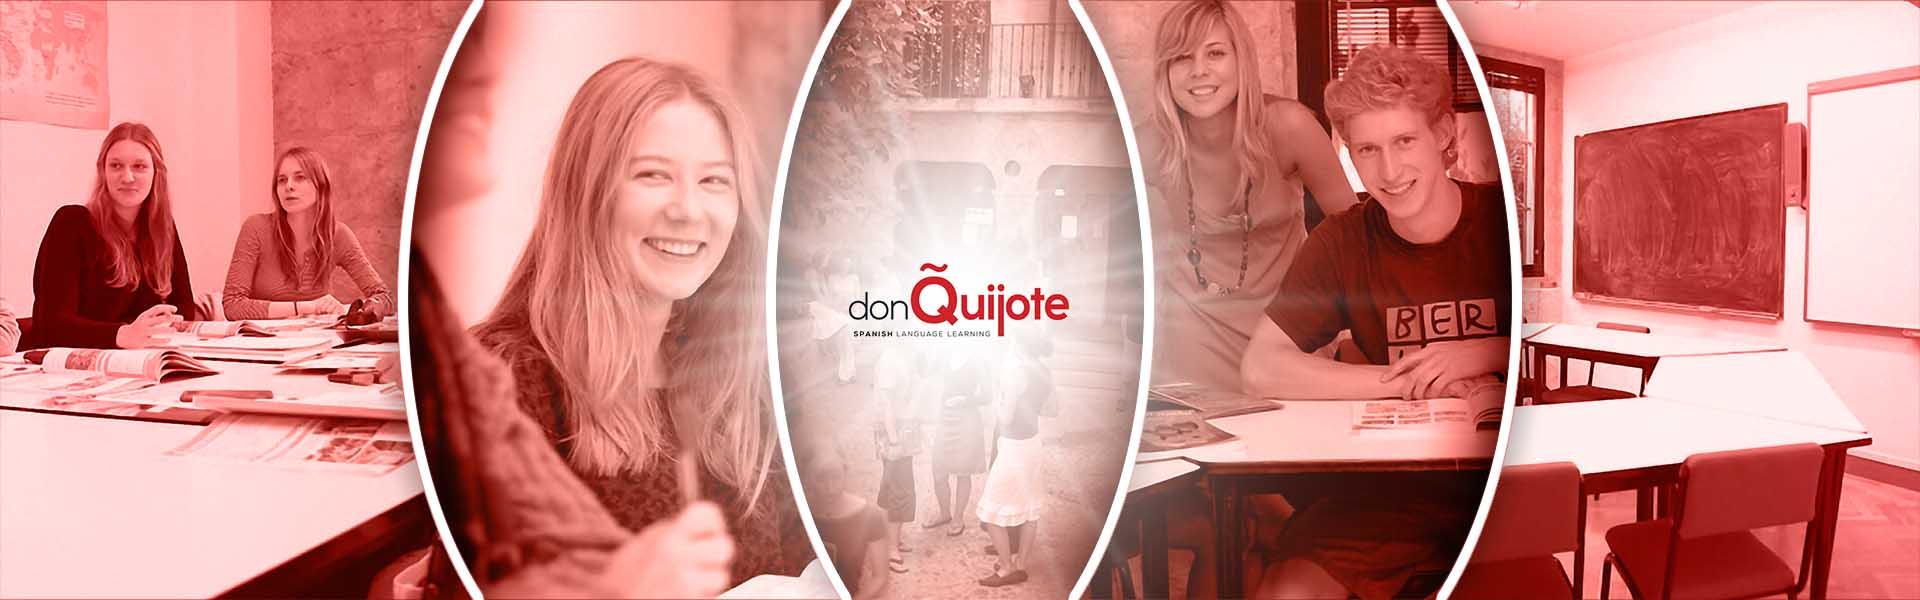 Don Quijote Salamanca Dil Okulu